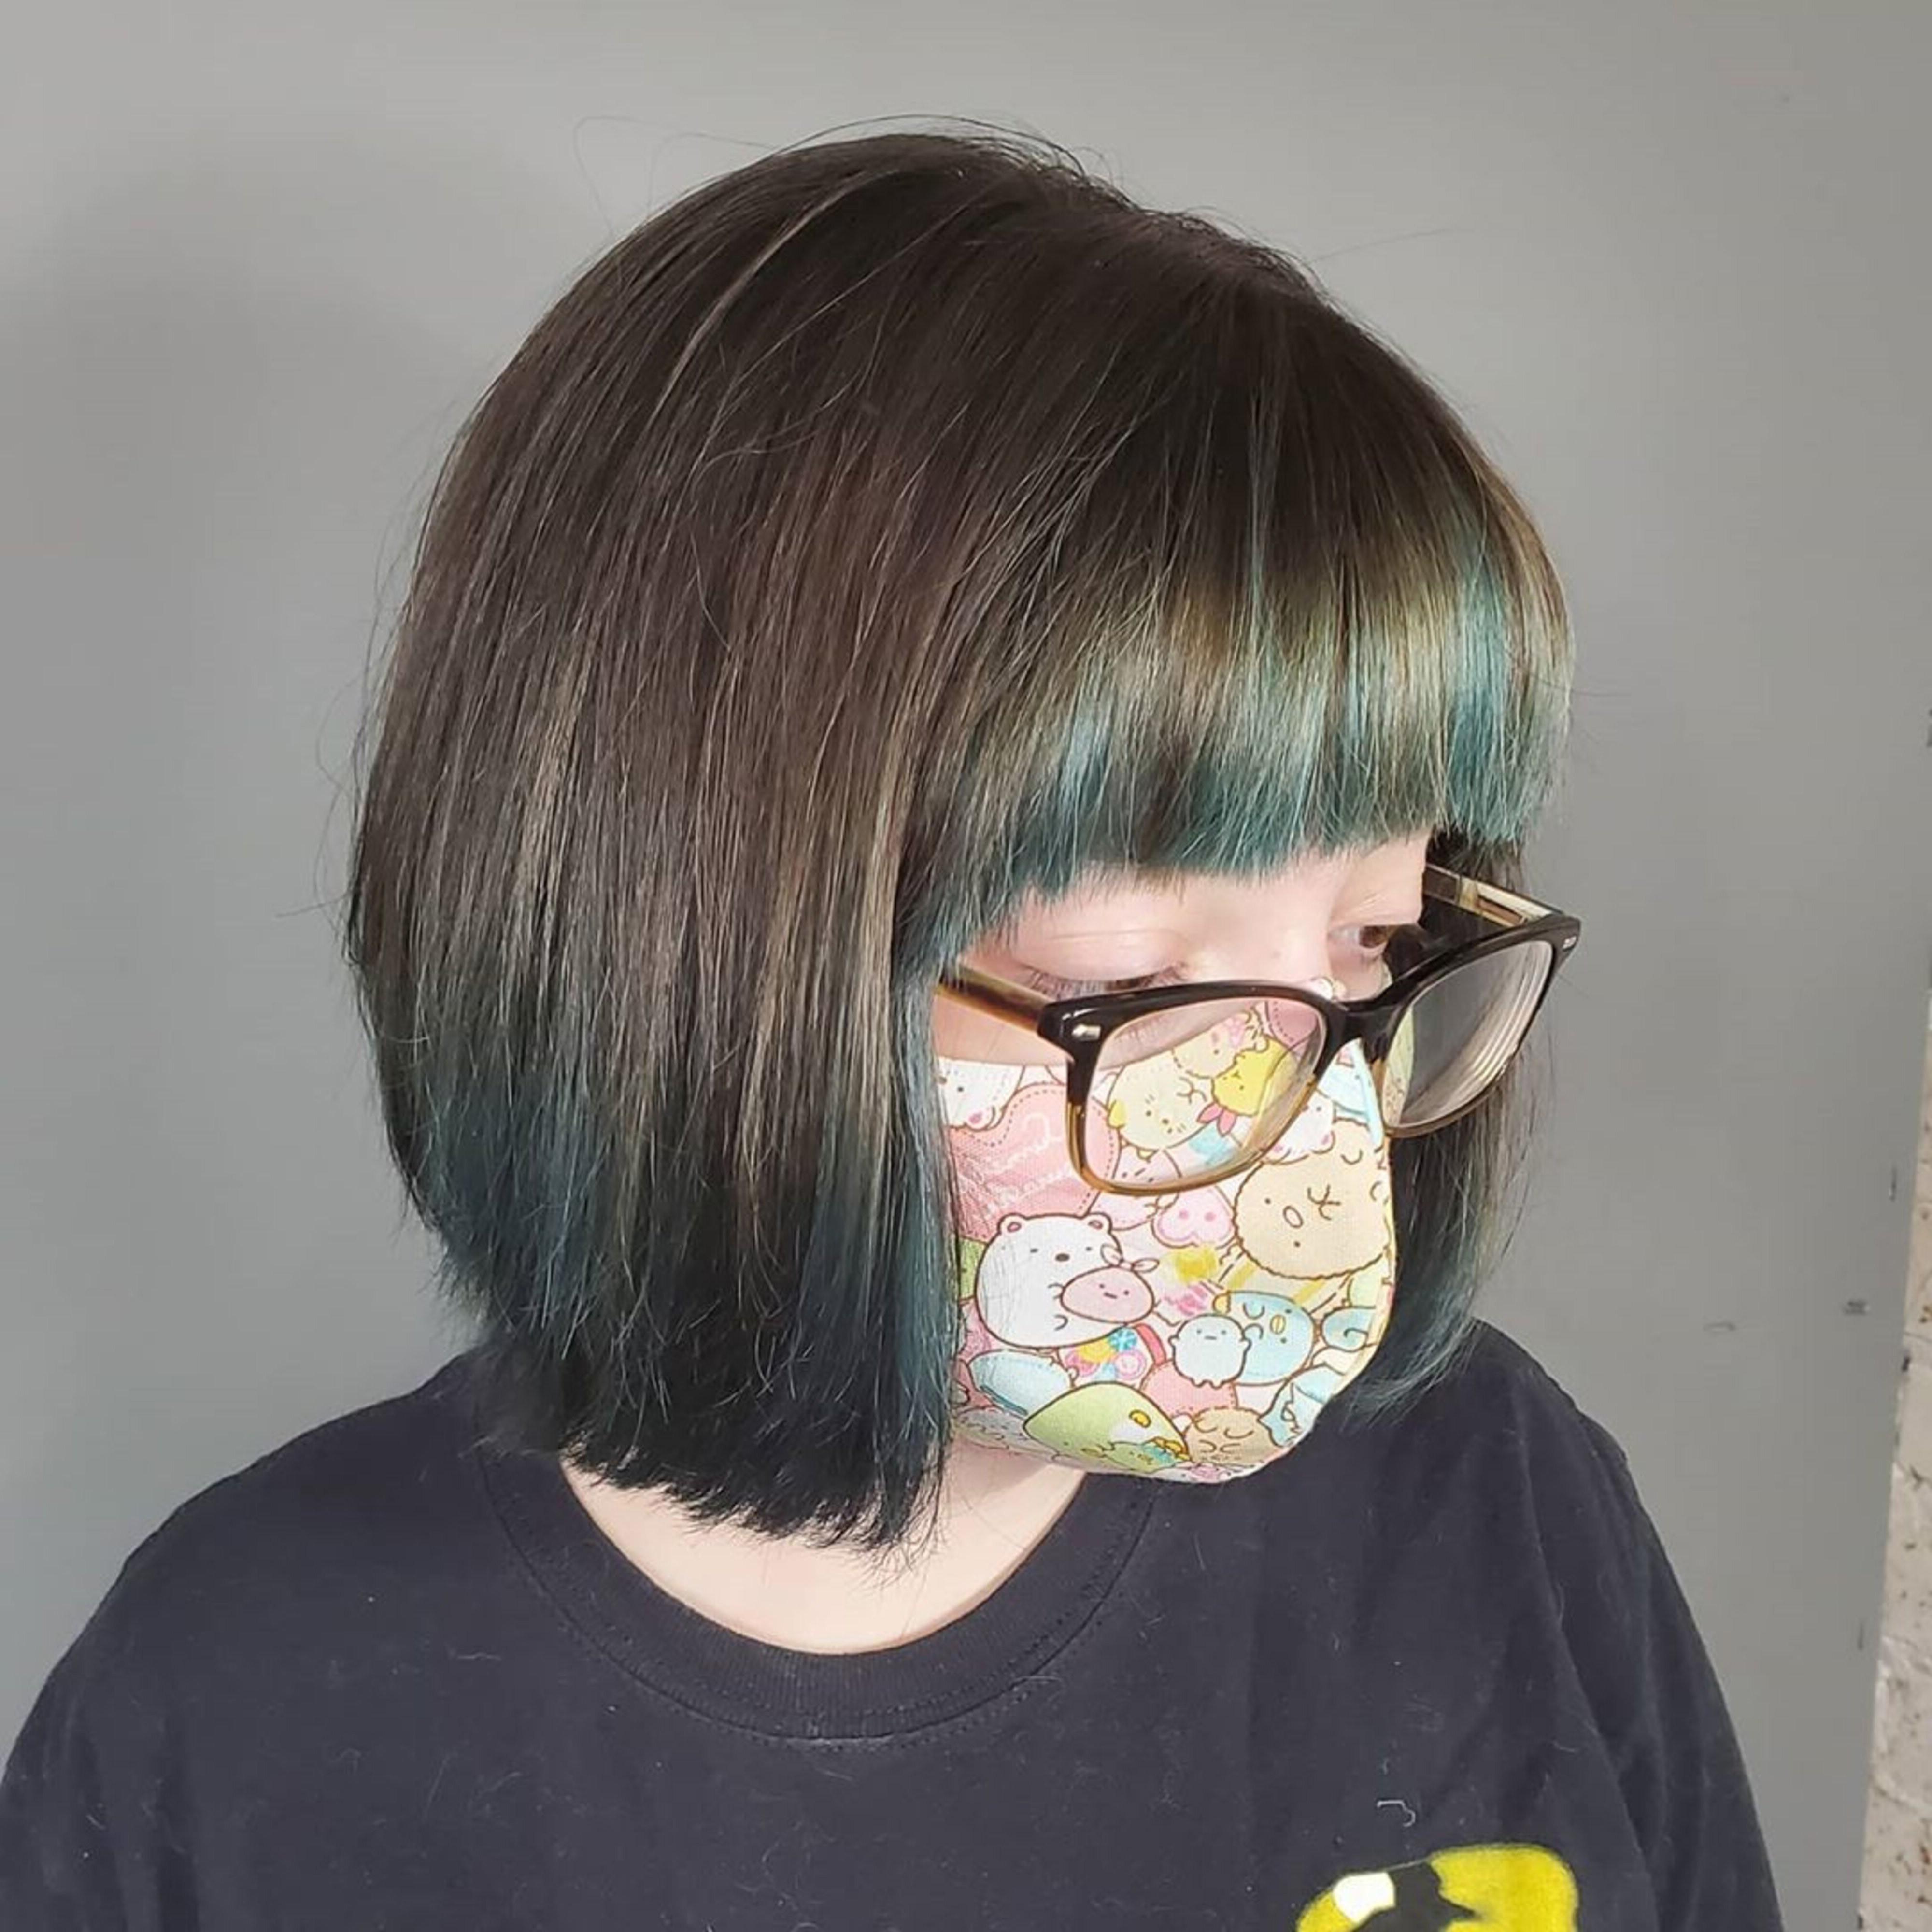 A mid-length bob haircut with bangs.